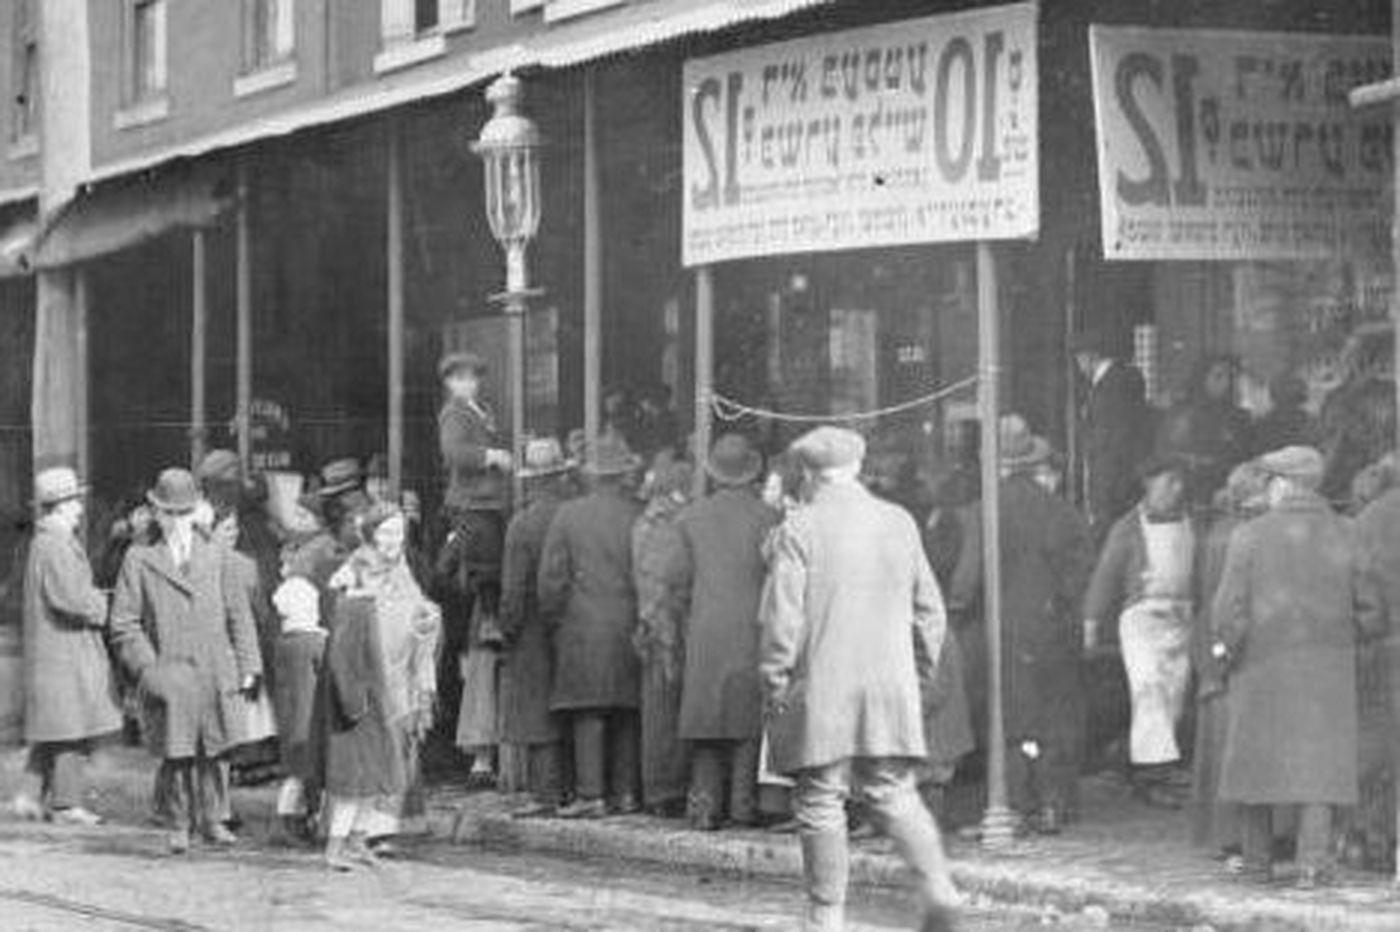 In the making: Documentary explores Philadelphia's Jewish story